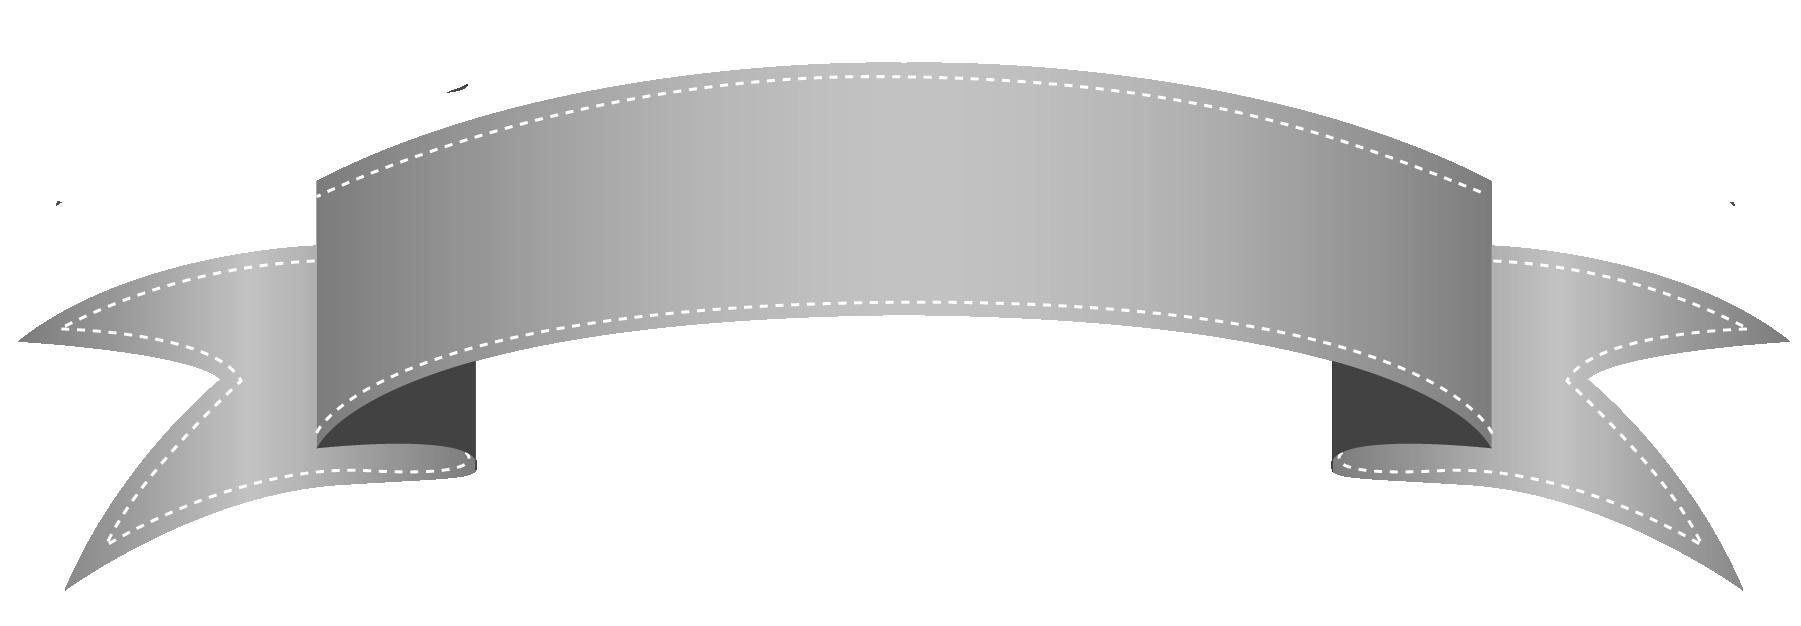 banner silver vector metal banner #103085838